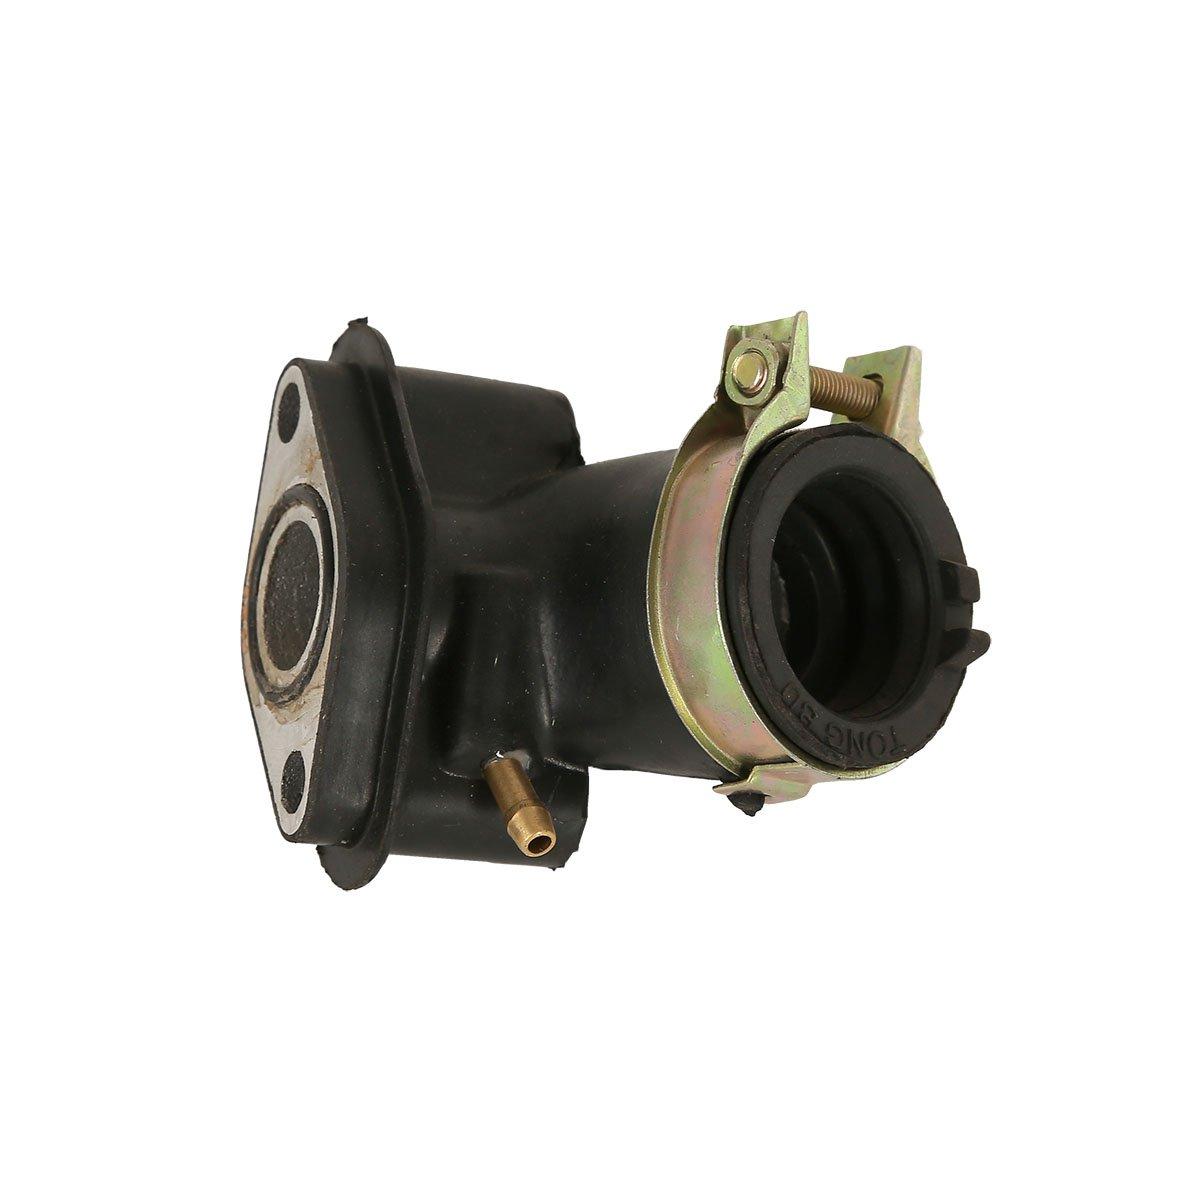 XFMT GY6 50CC To 80CC Big Bore Cylinder A9 Cam 64mm For Roketa Taotao Baja Scooter